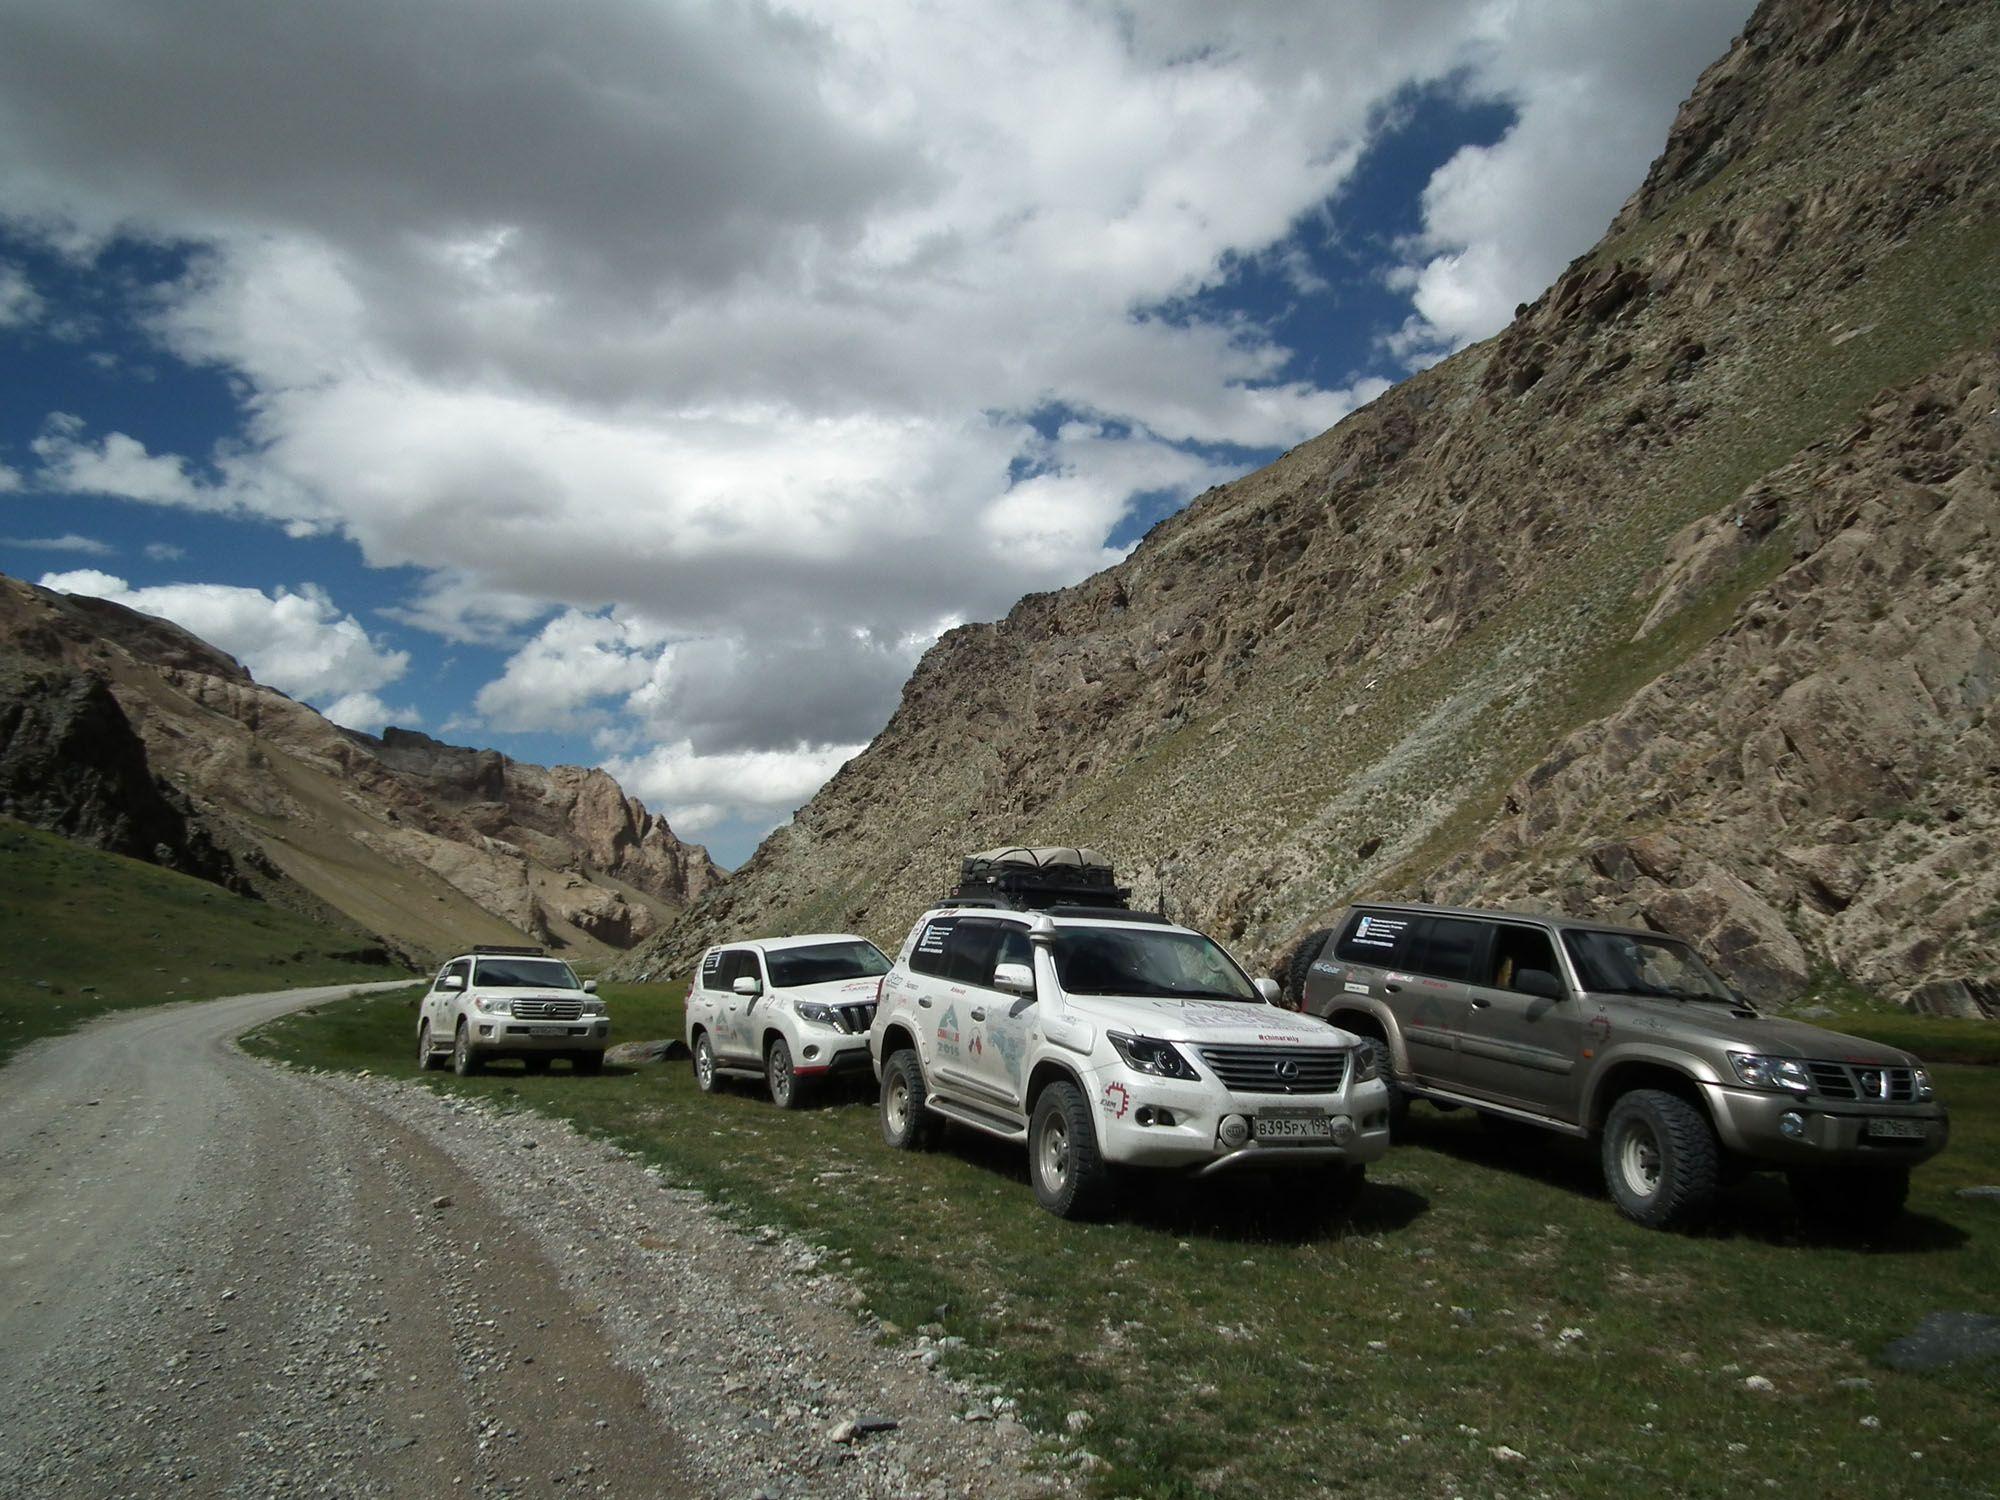 ChinaRally 2015. Киргизия - http://amsrus.ru/2015/10/30/chinarally-2015-kirgiziya/